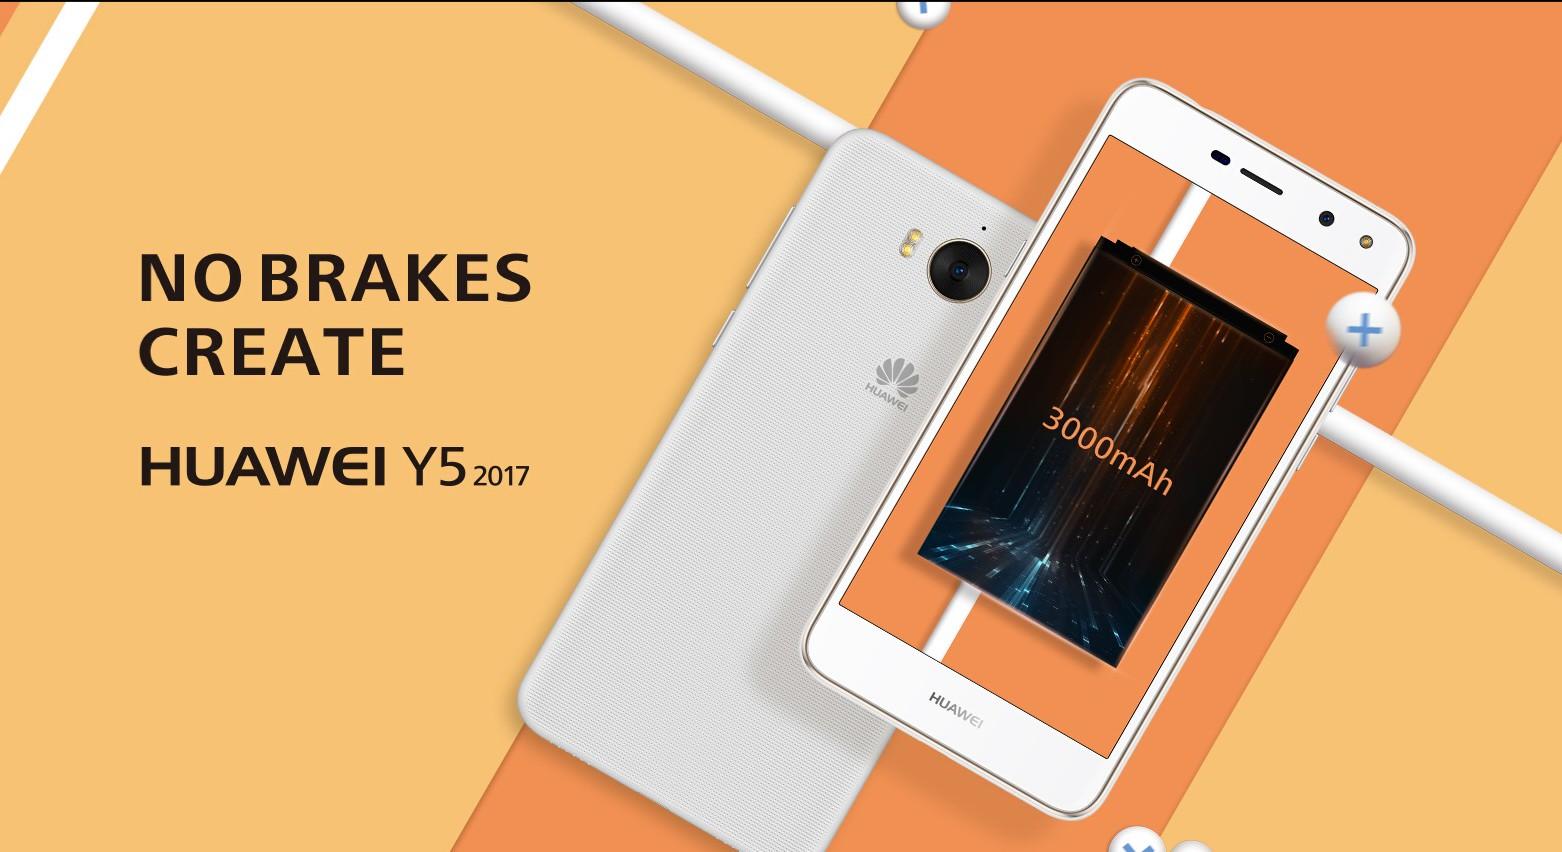 Huawei Y5 2017 with HD display, MTK6737T SoC, 3000mAh battery